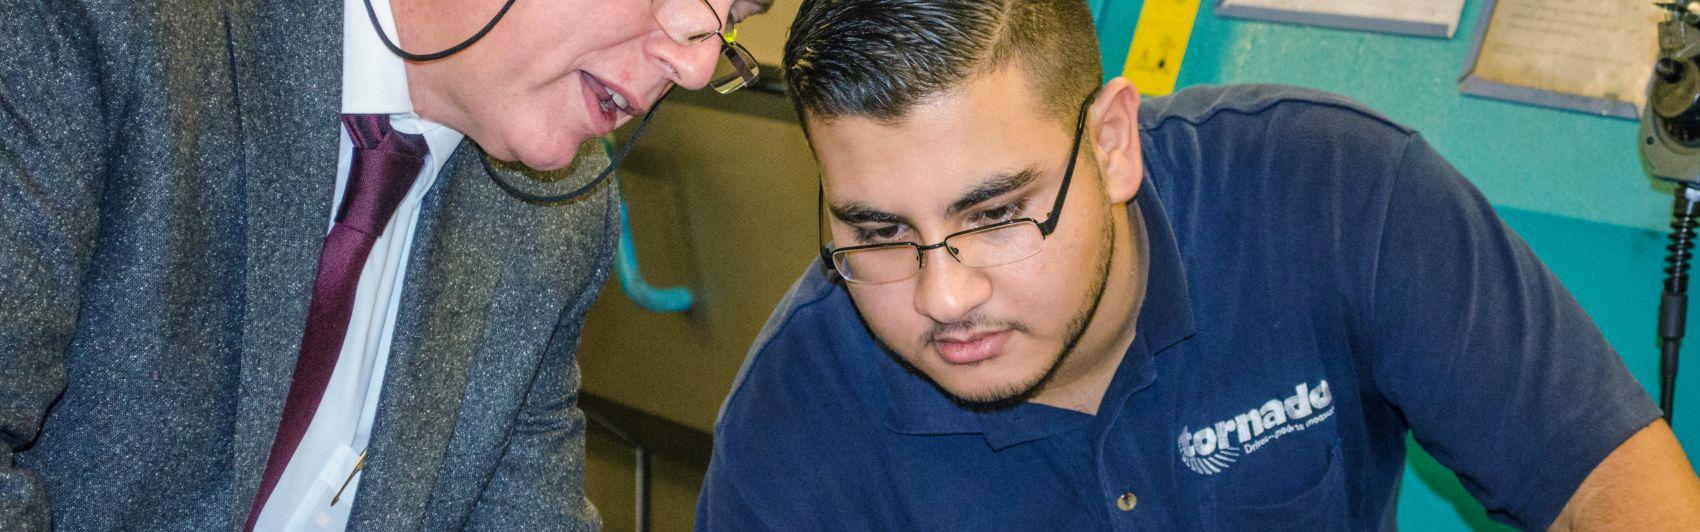 Ausbildung Integration Metall Elektro Industrie Zuwanderung